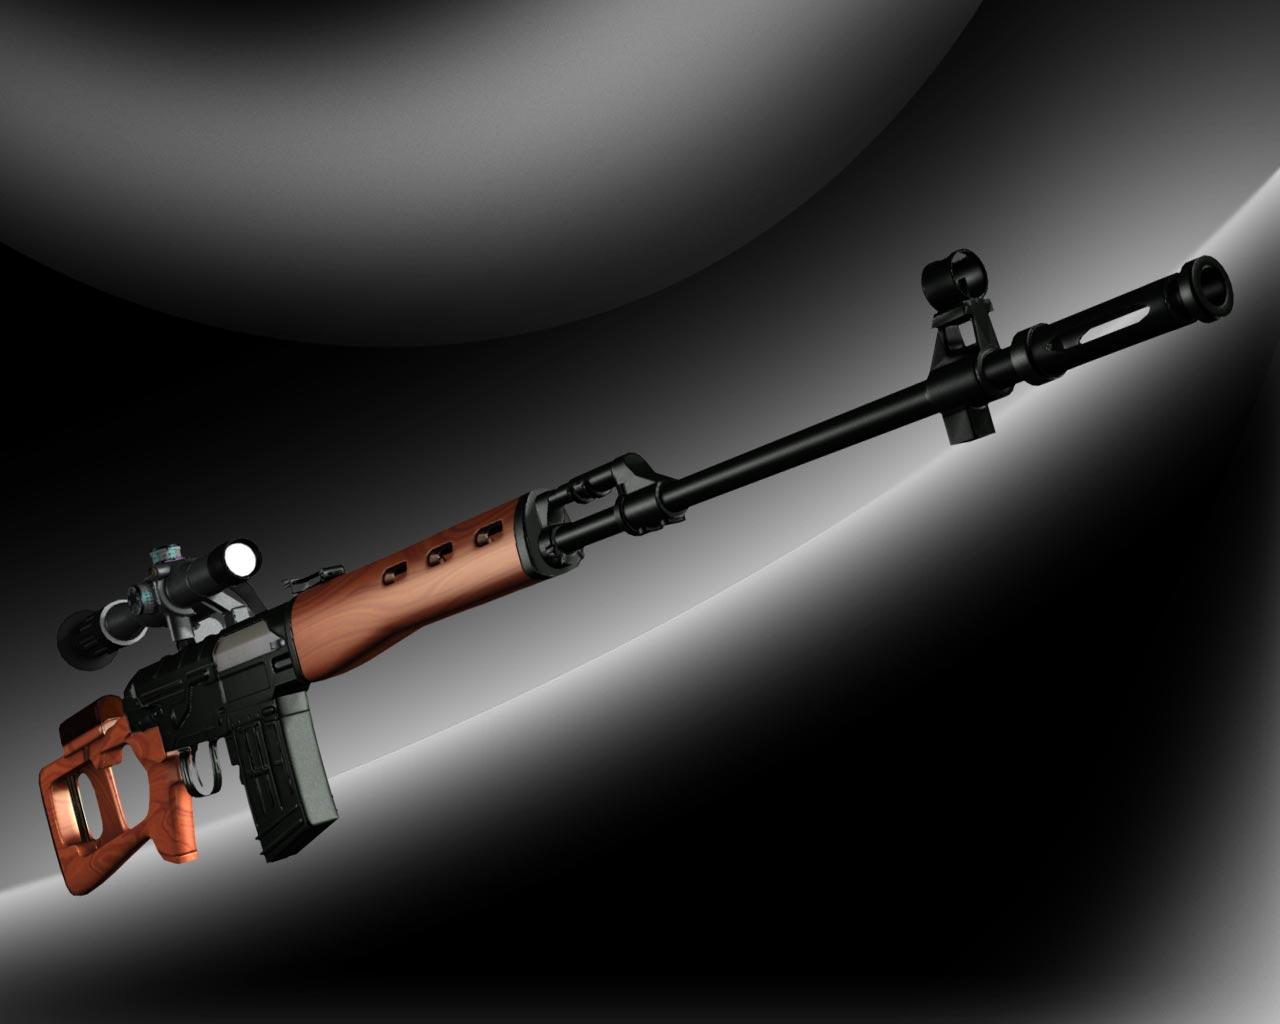 reliable sniper rifles in Dragunov Sniper Rifle Wallpaper Hd